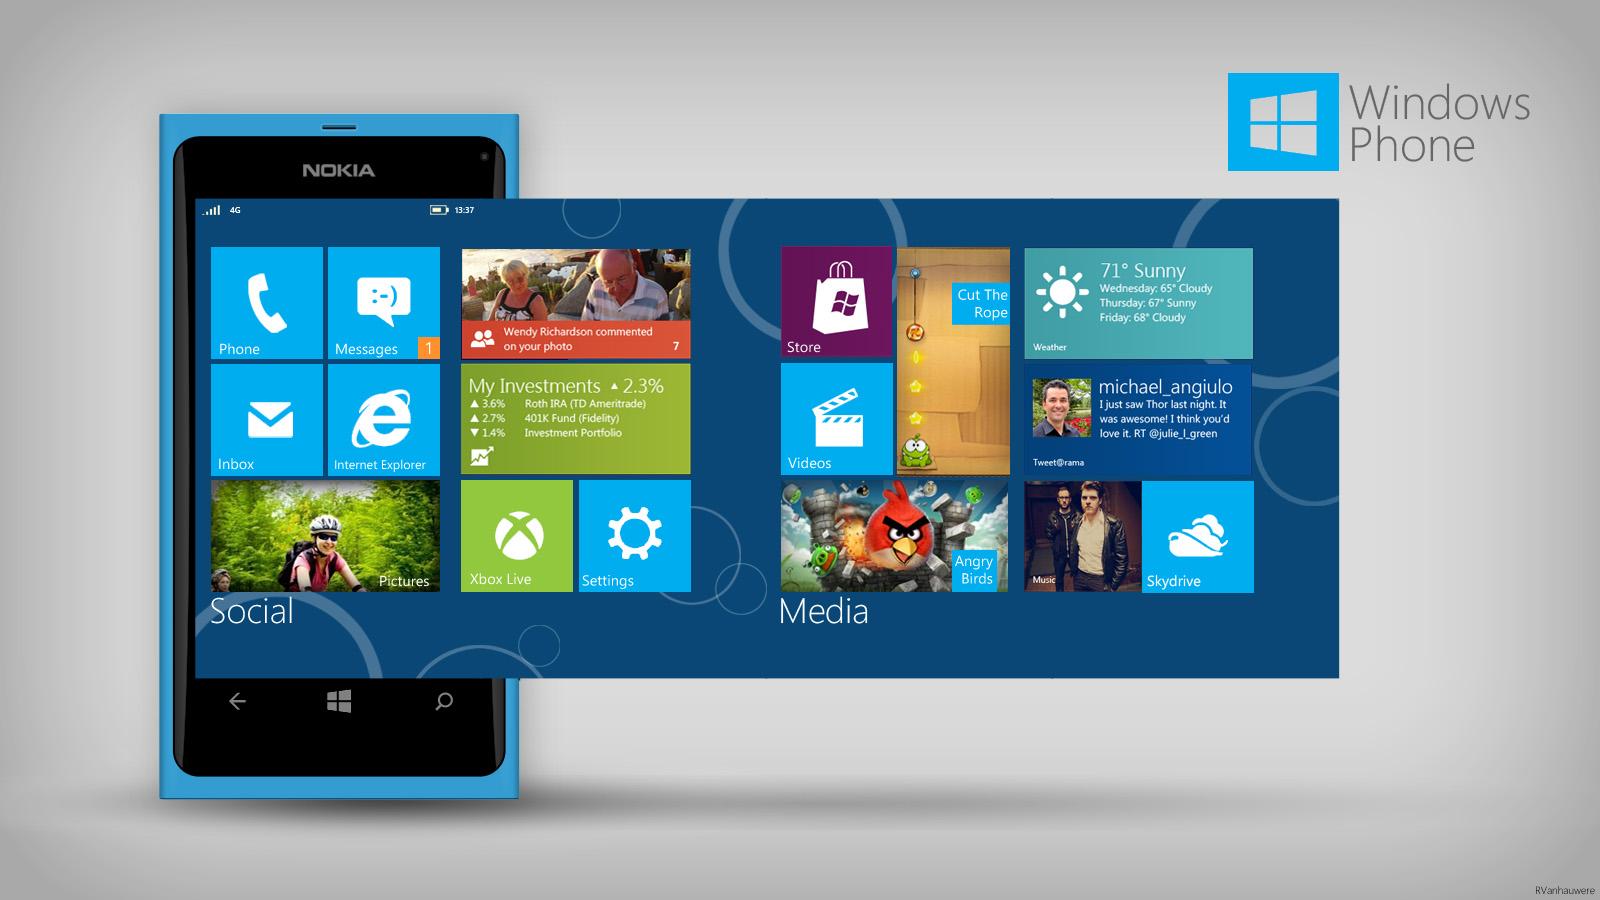 WindowsPhone.jpeg